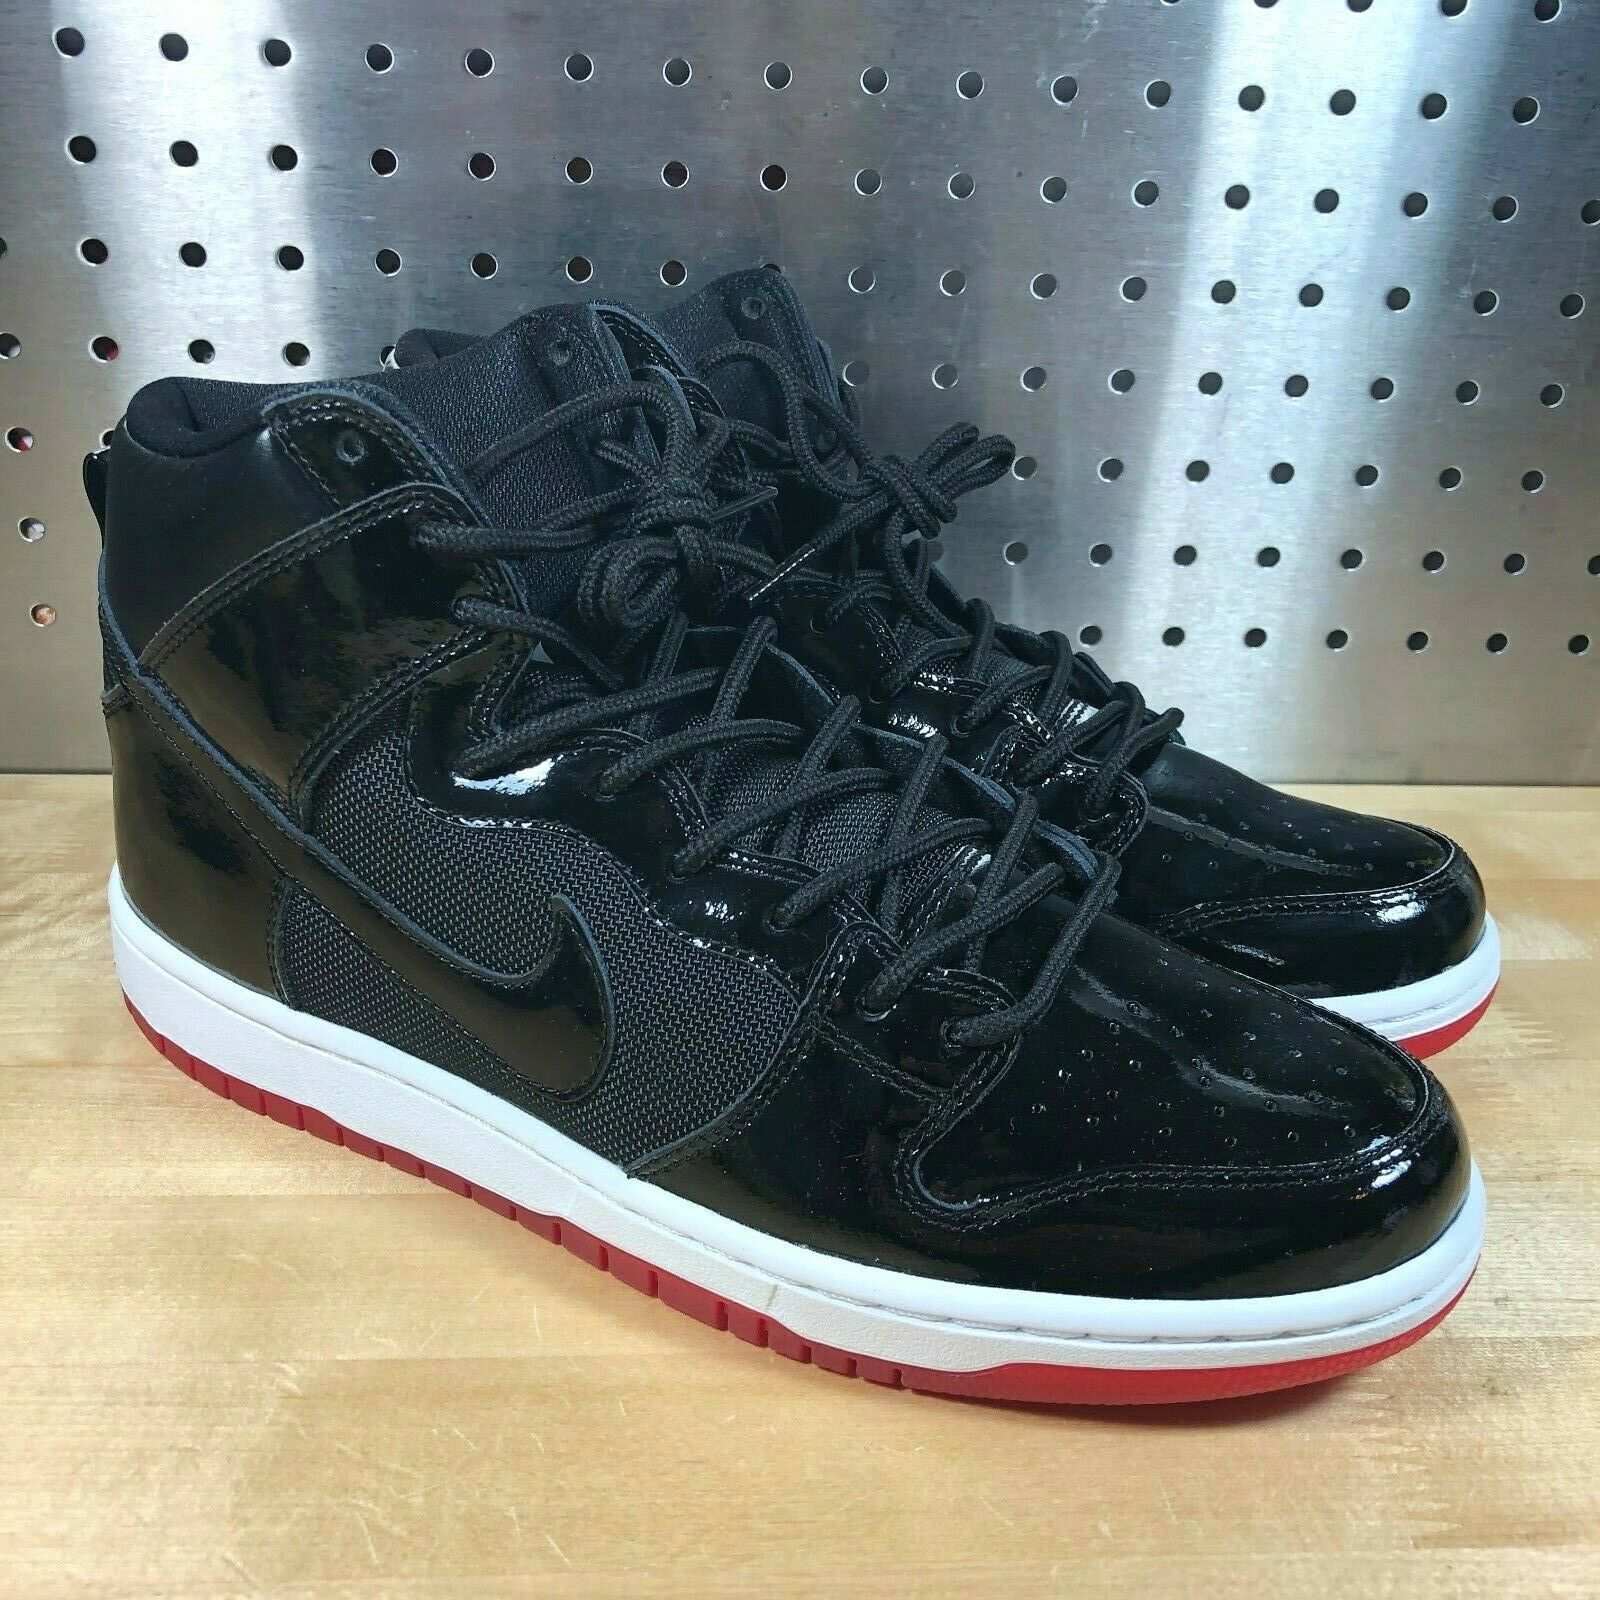 Details About Air Jordan Big Fund Mens Shoes Black Silver Red